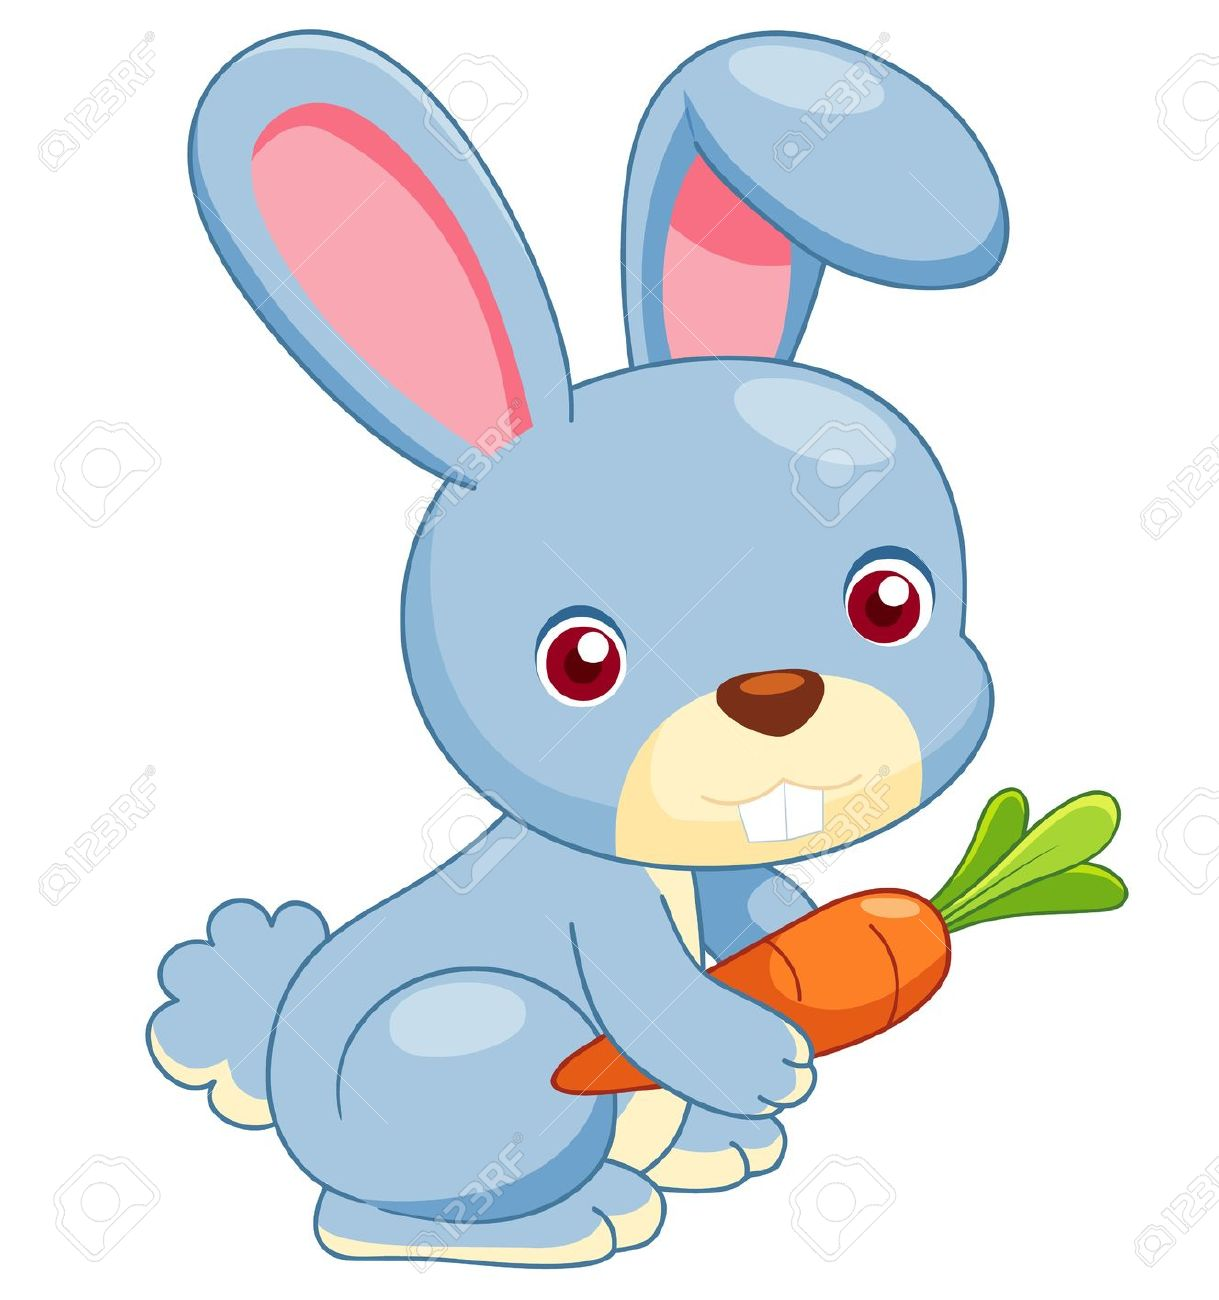 1219x1300 Cartoon Rabbit Image Kids Coloring